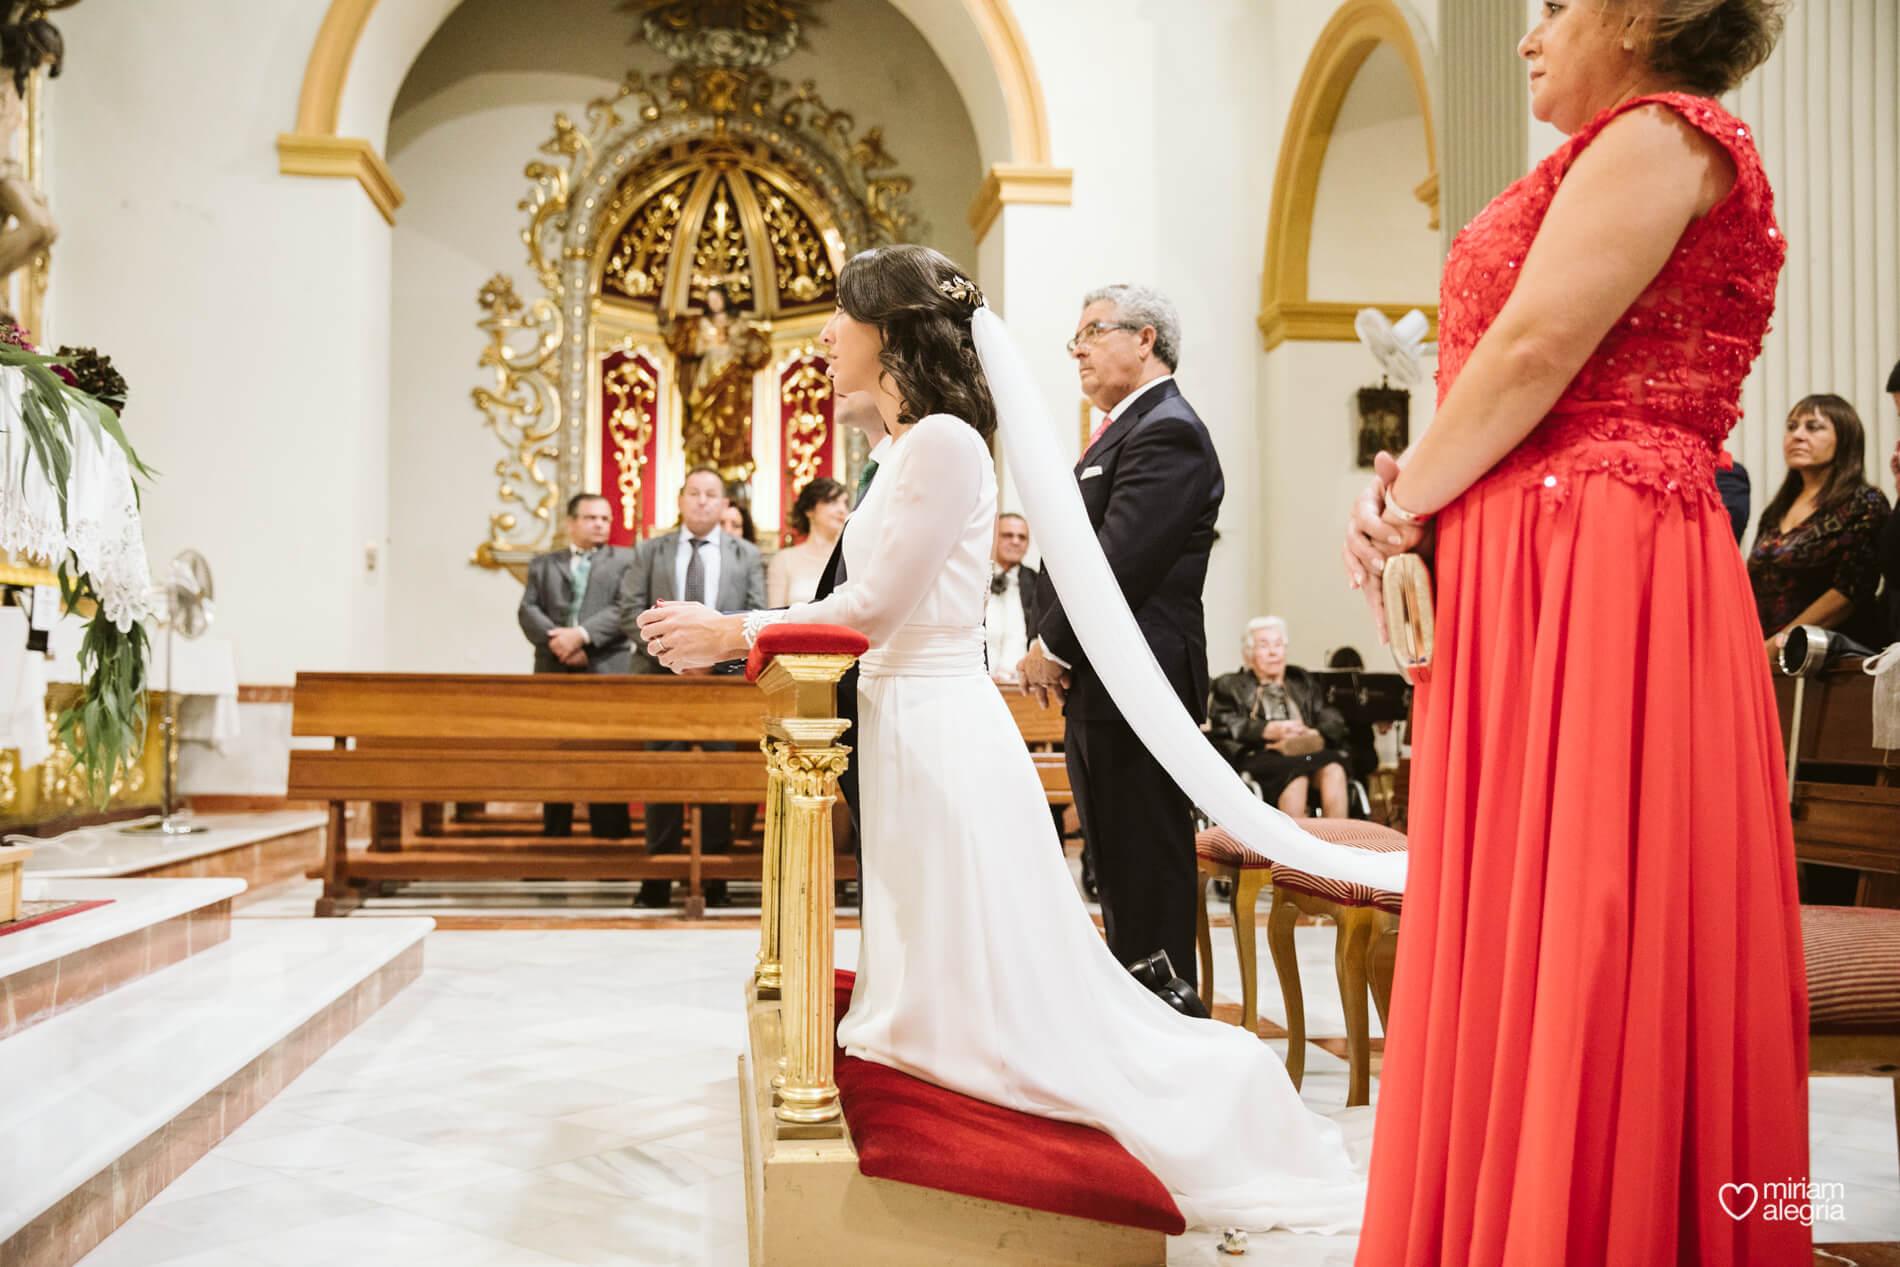 boda-en-iglesia-del-carmen-cartagena-73